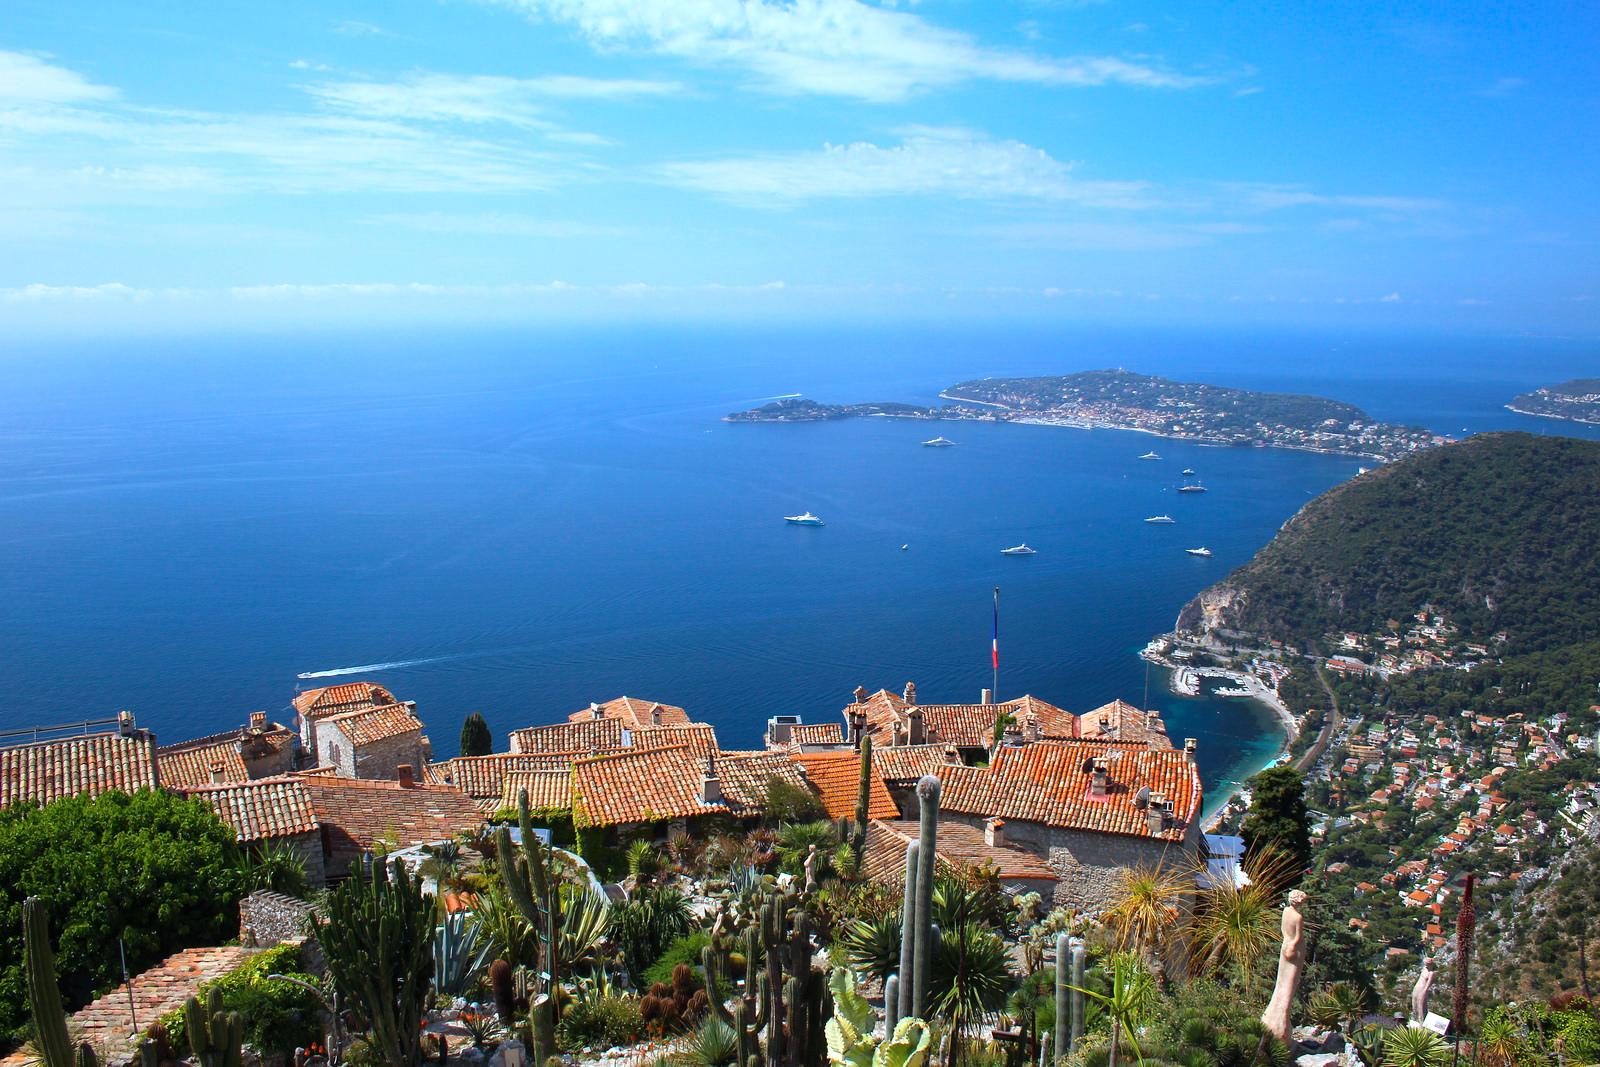 Breath-taking view of one of France's top tourist destincation, Cote d'Azur